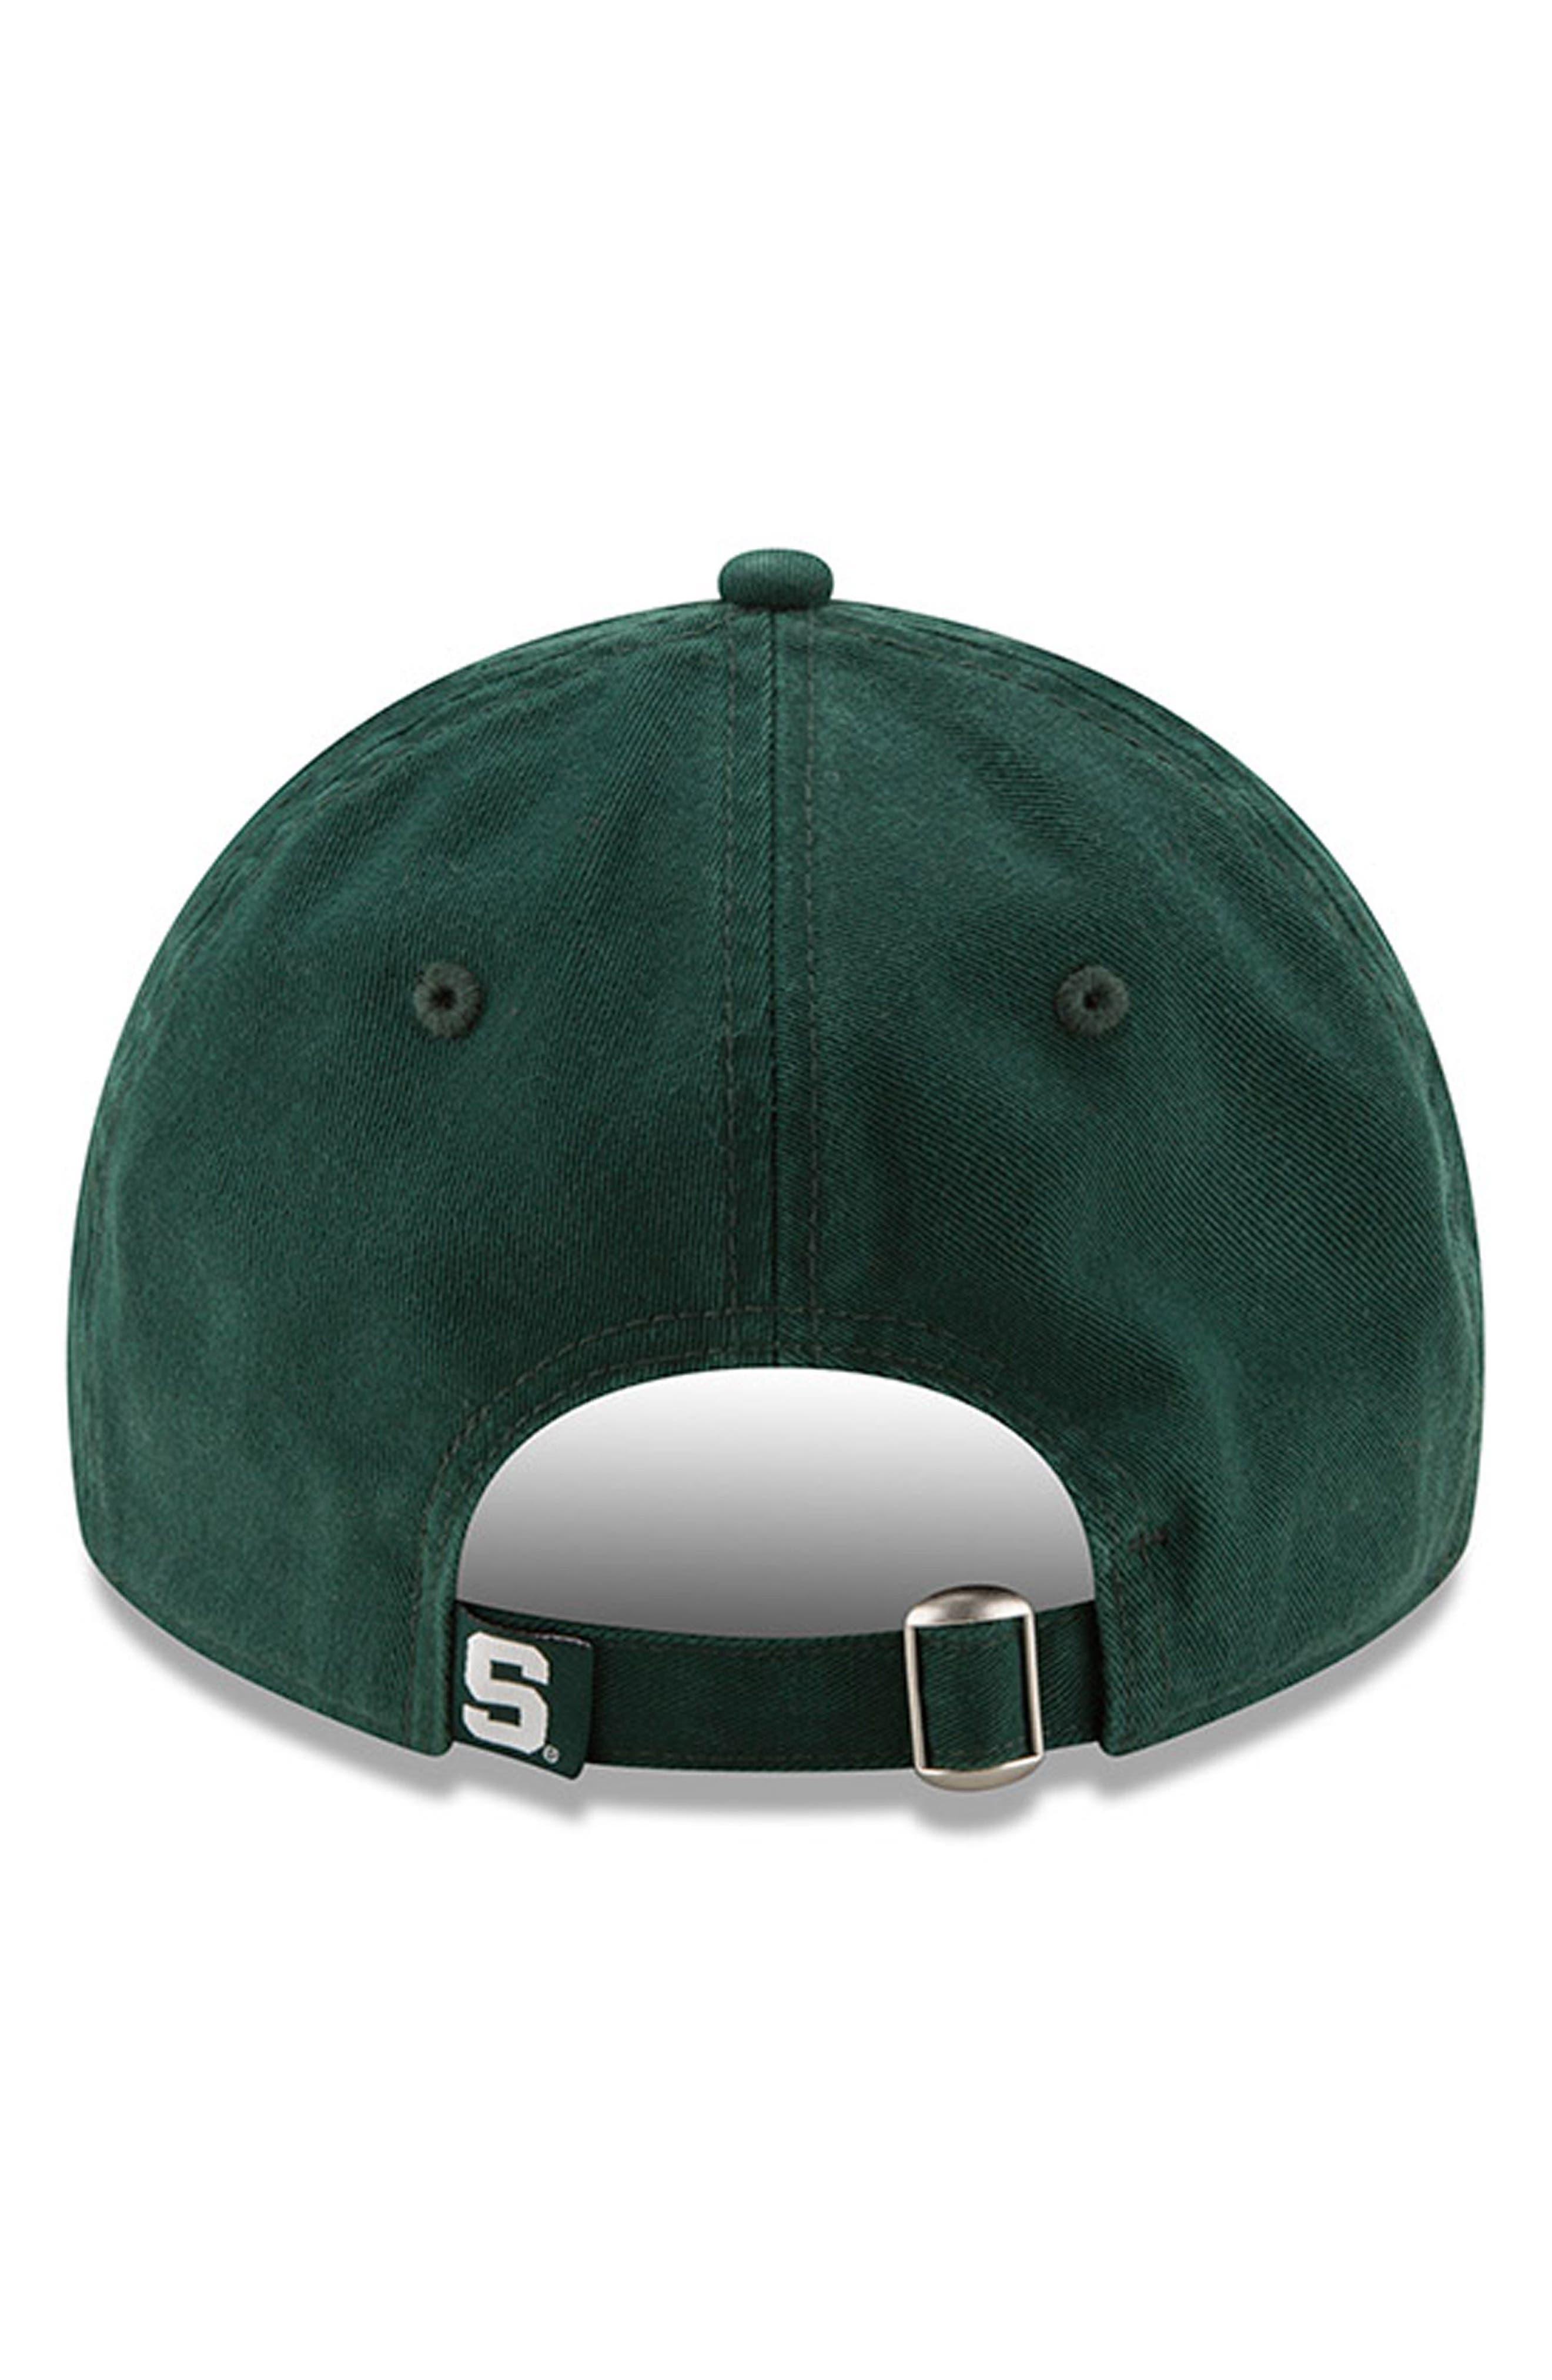 New Era Collegiate Core Classic - Michigan State Spartans Baseball Cap,                             Alternate thumbnail 3, color,                             301